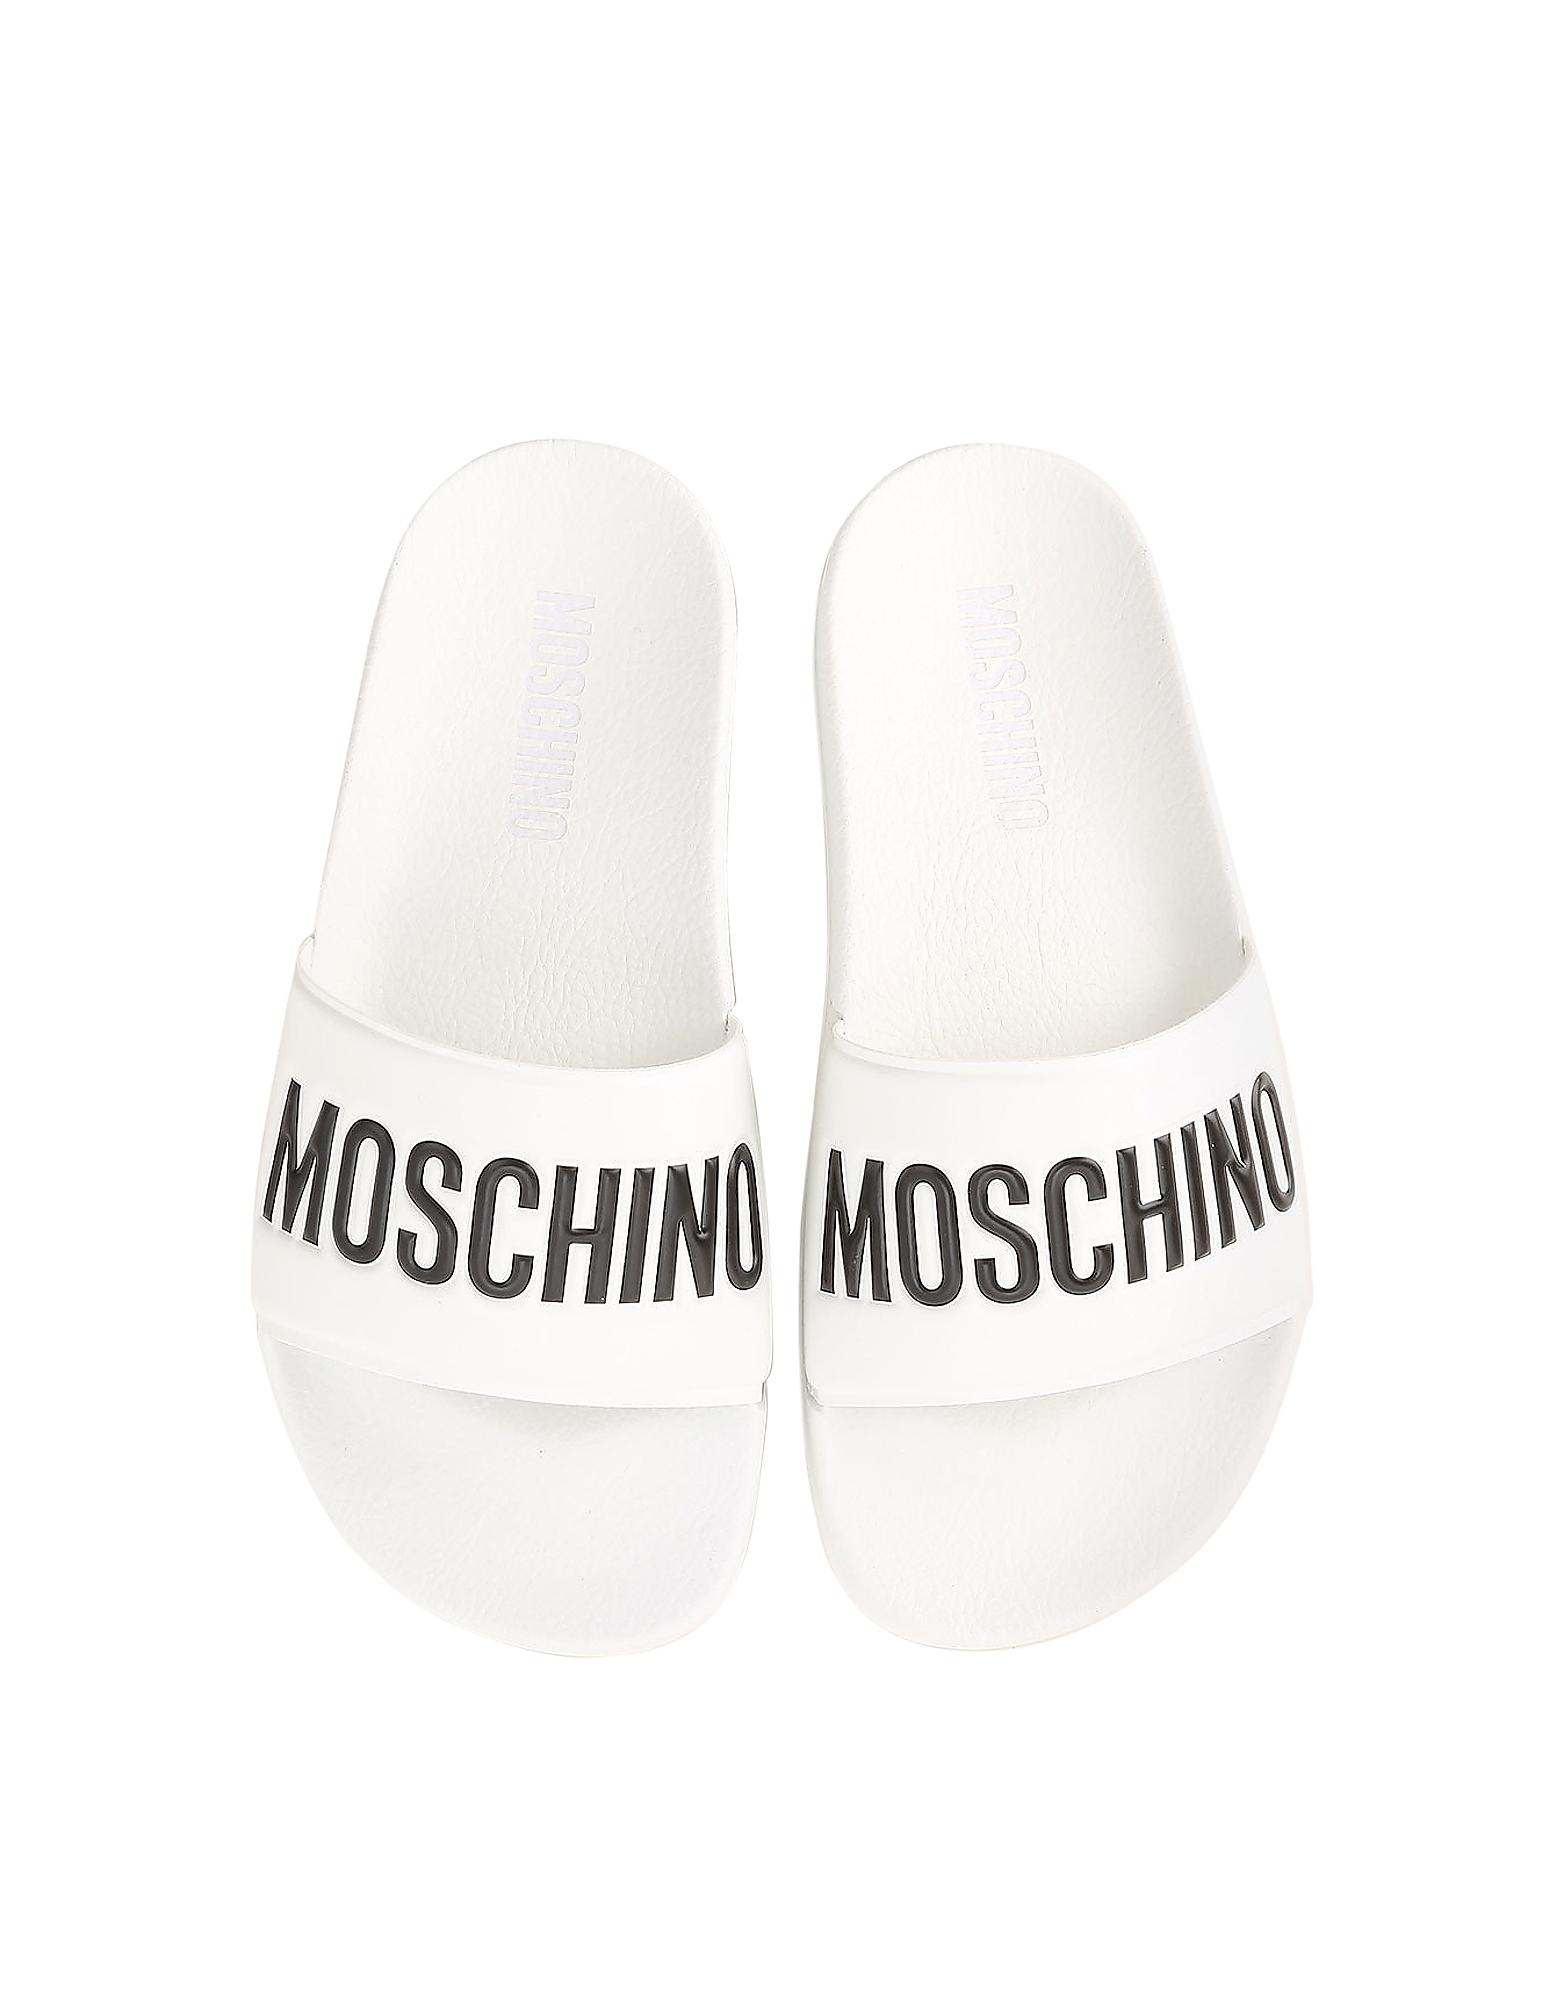 Moschino Shoes, White Pool Slider Sandals w/Black Logo